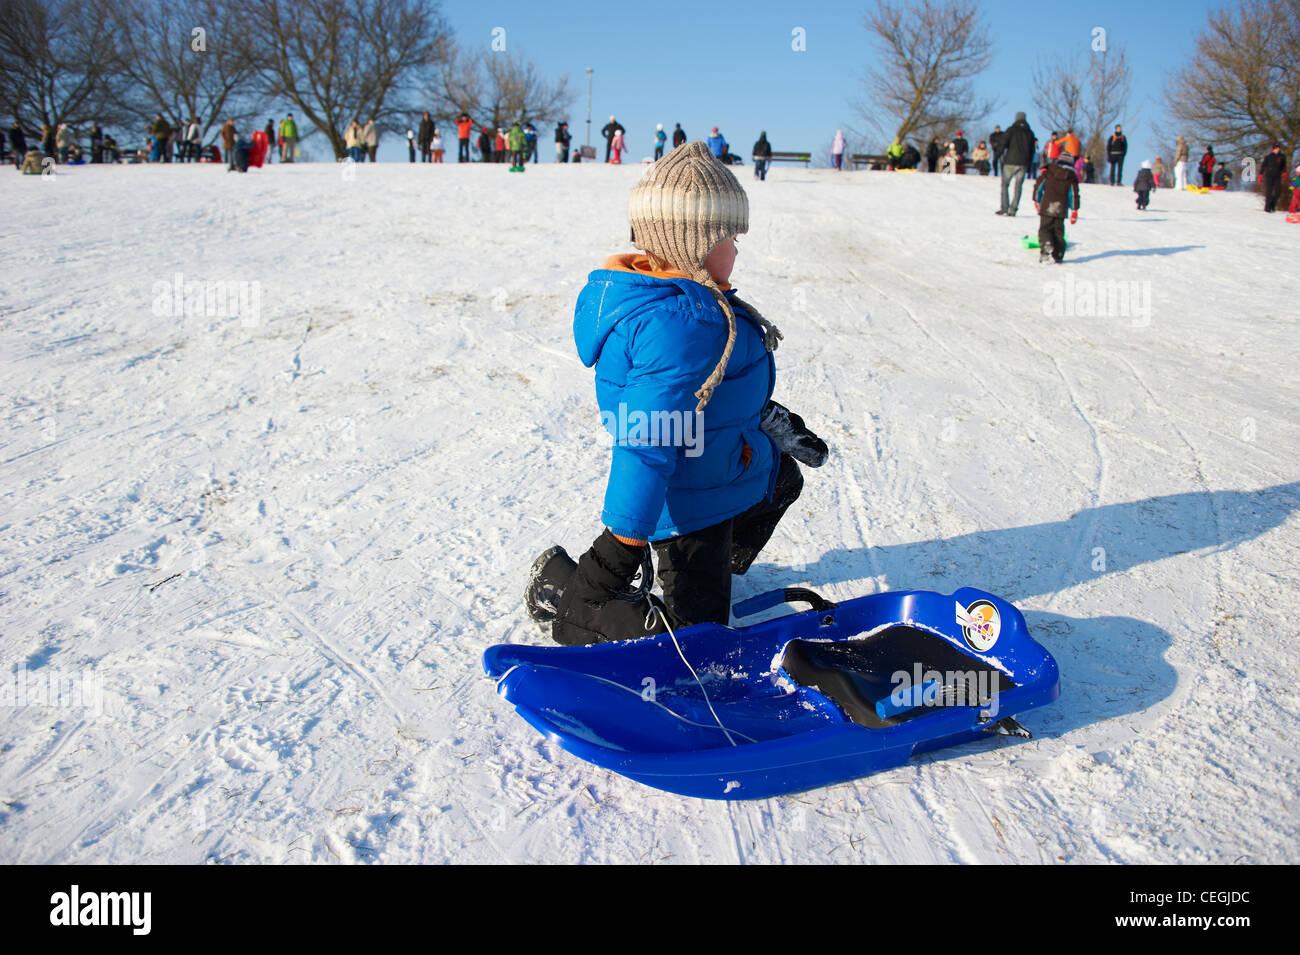 bbb2bfb15 A child little boy sledding downhill winter Stock Photo: 43391640 ...